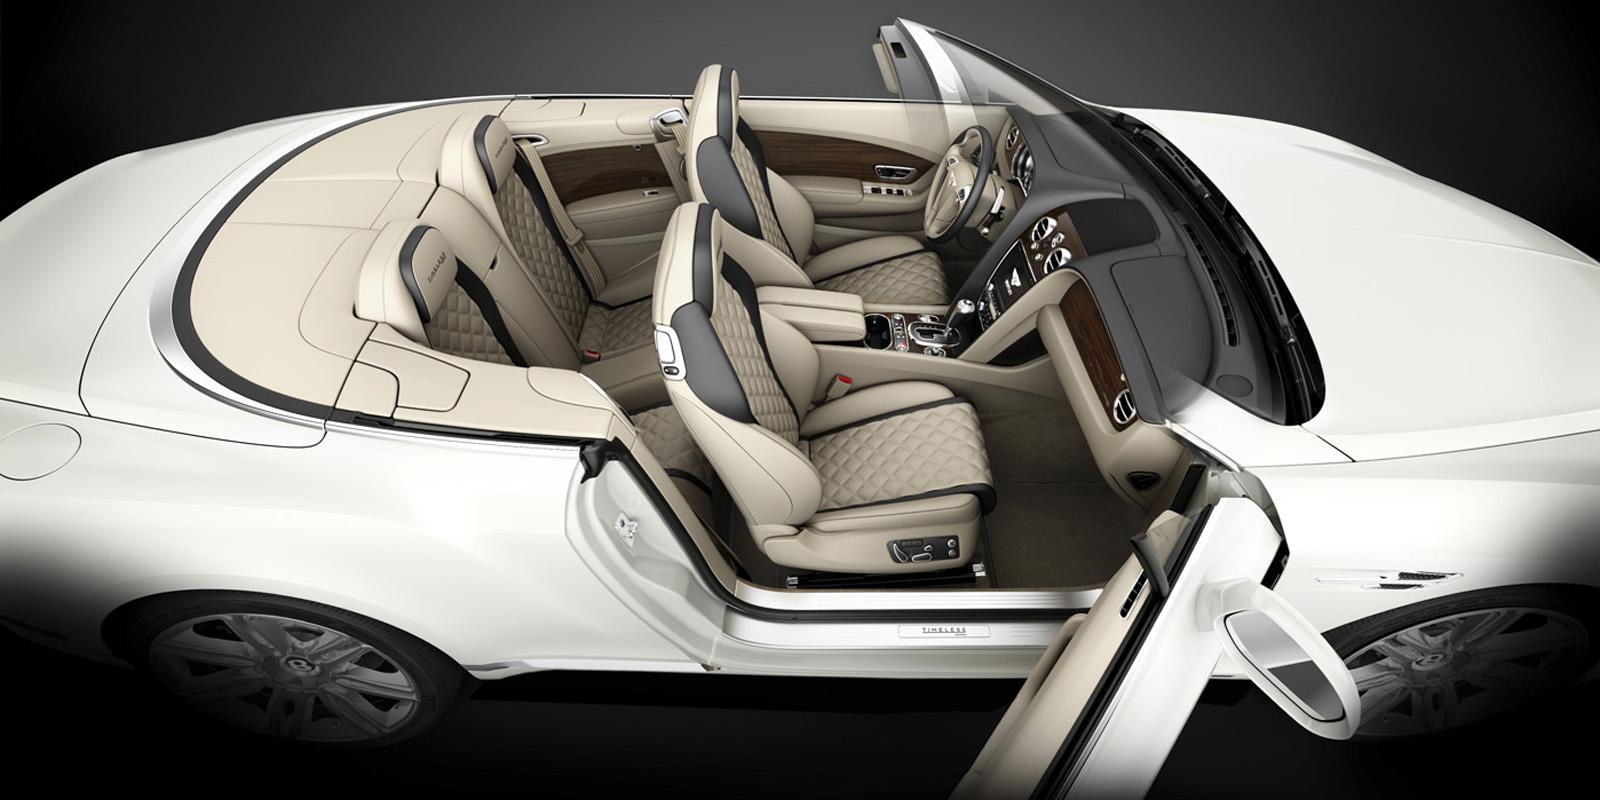 Bentley_Continental_GTC_Timeless_Series_05